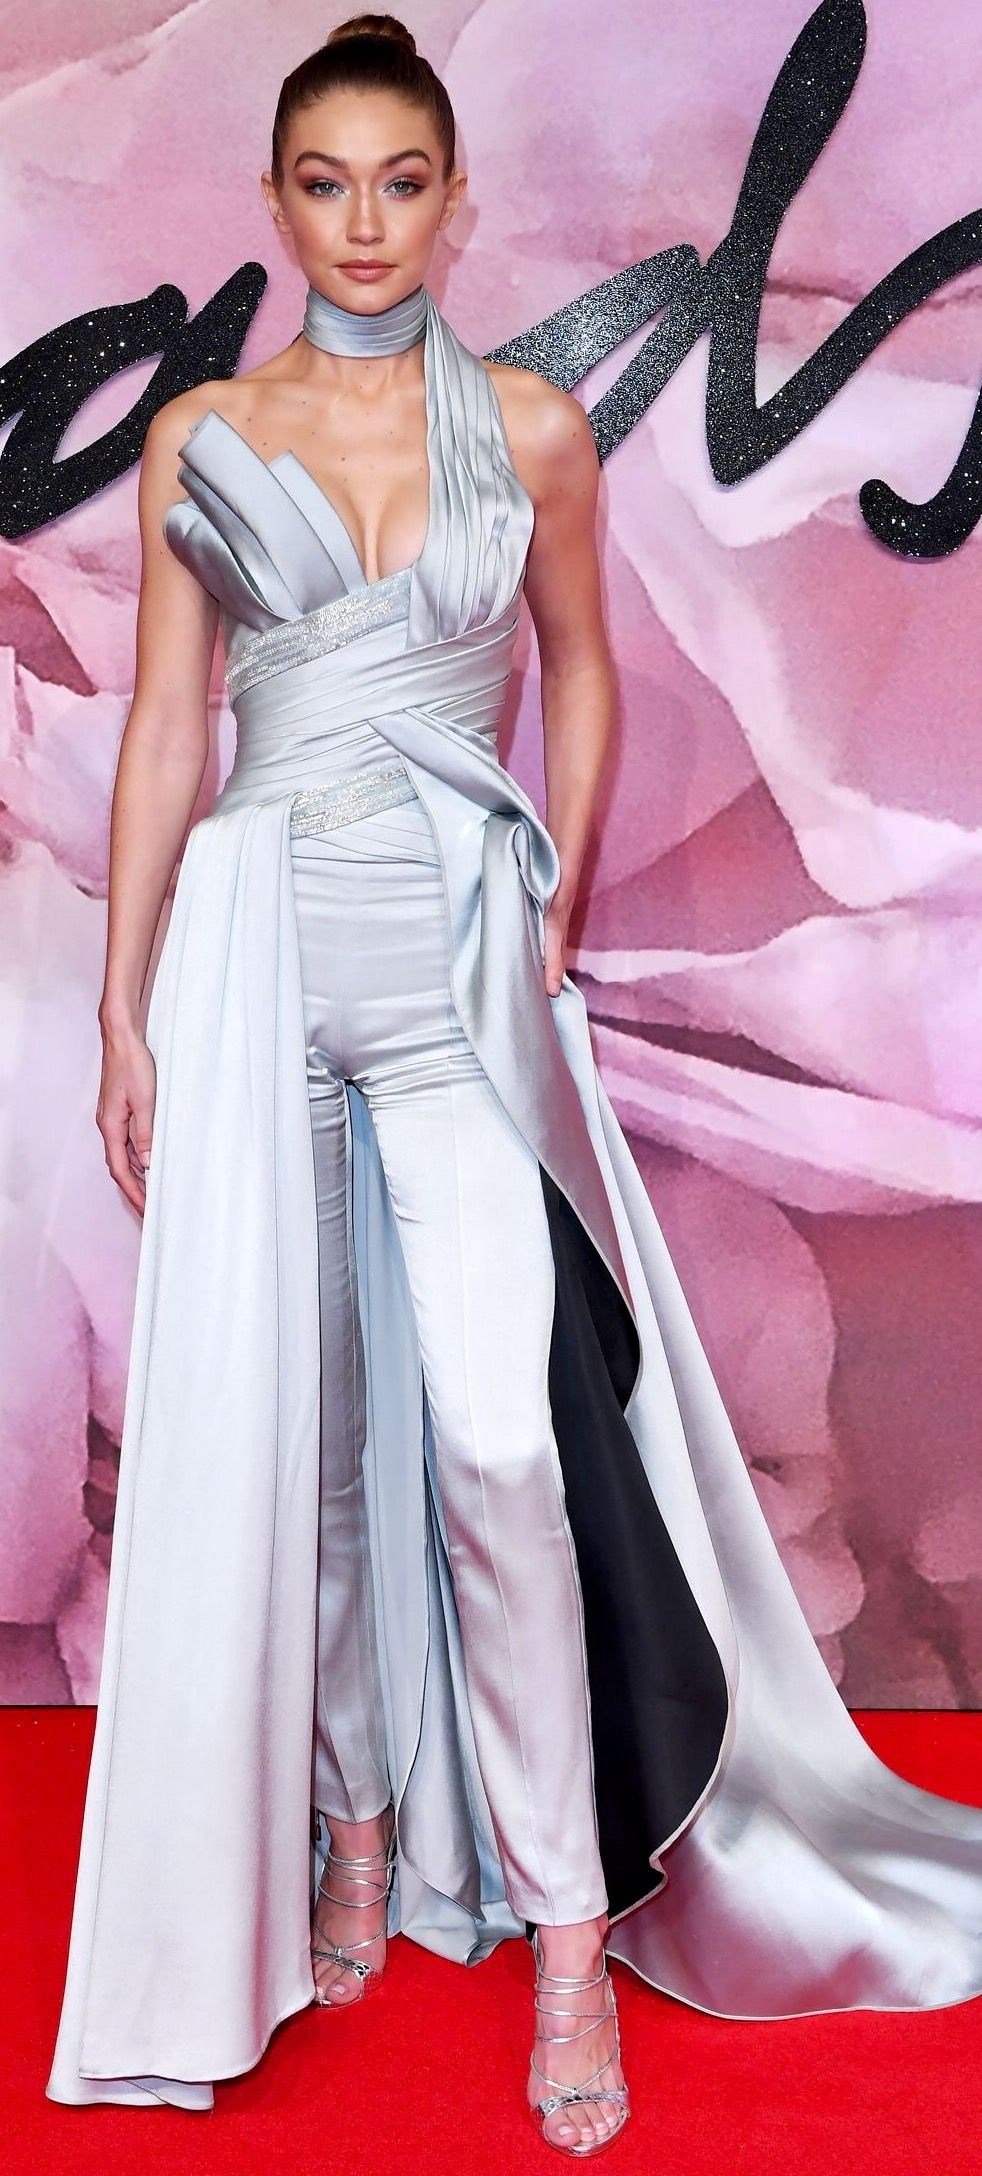 Gigi Hadid | Gigi hadid and other models :-) | Pinterest | Vestidos ...